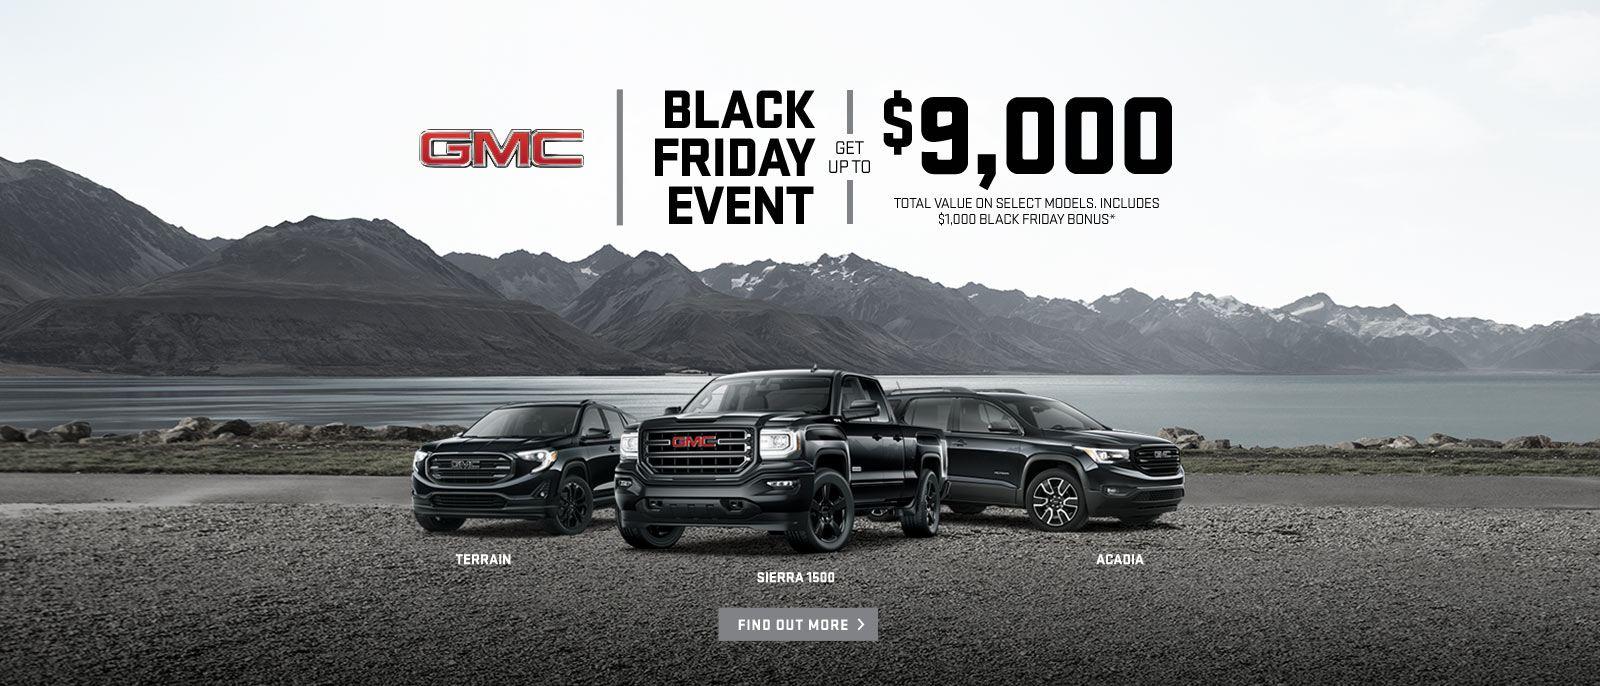 Black Friday Event 2018 GMC Sierra Terrain Acadia VanDusen Ajax 1600x868